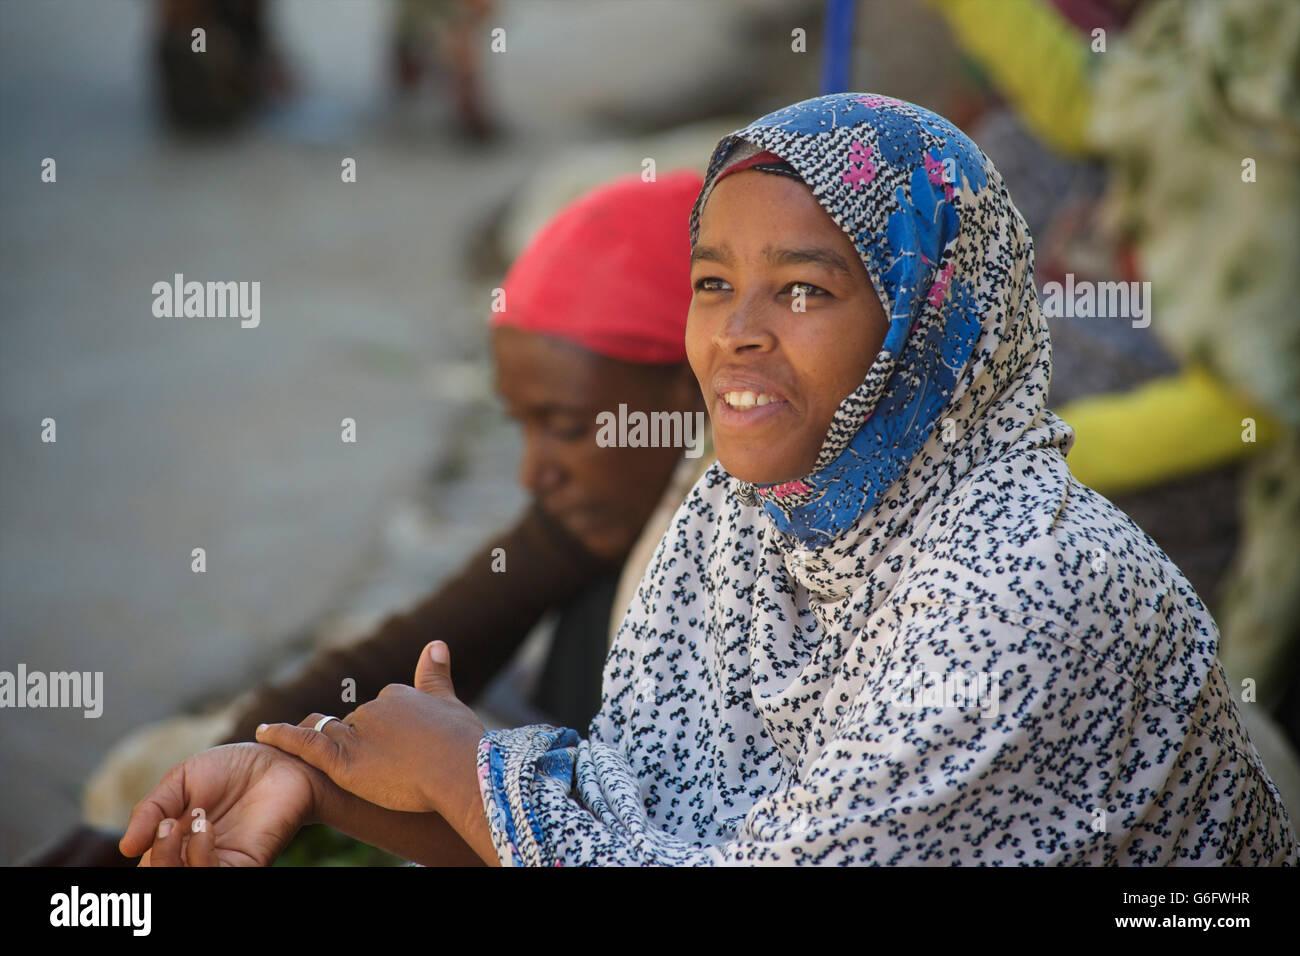 Harari woman in muslm hadcloth. Harar, Ethiopia - Stock Image